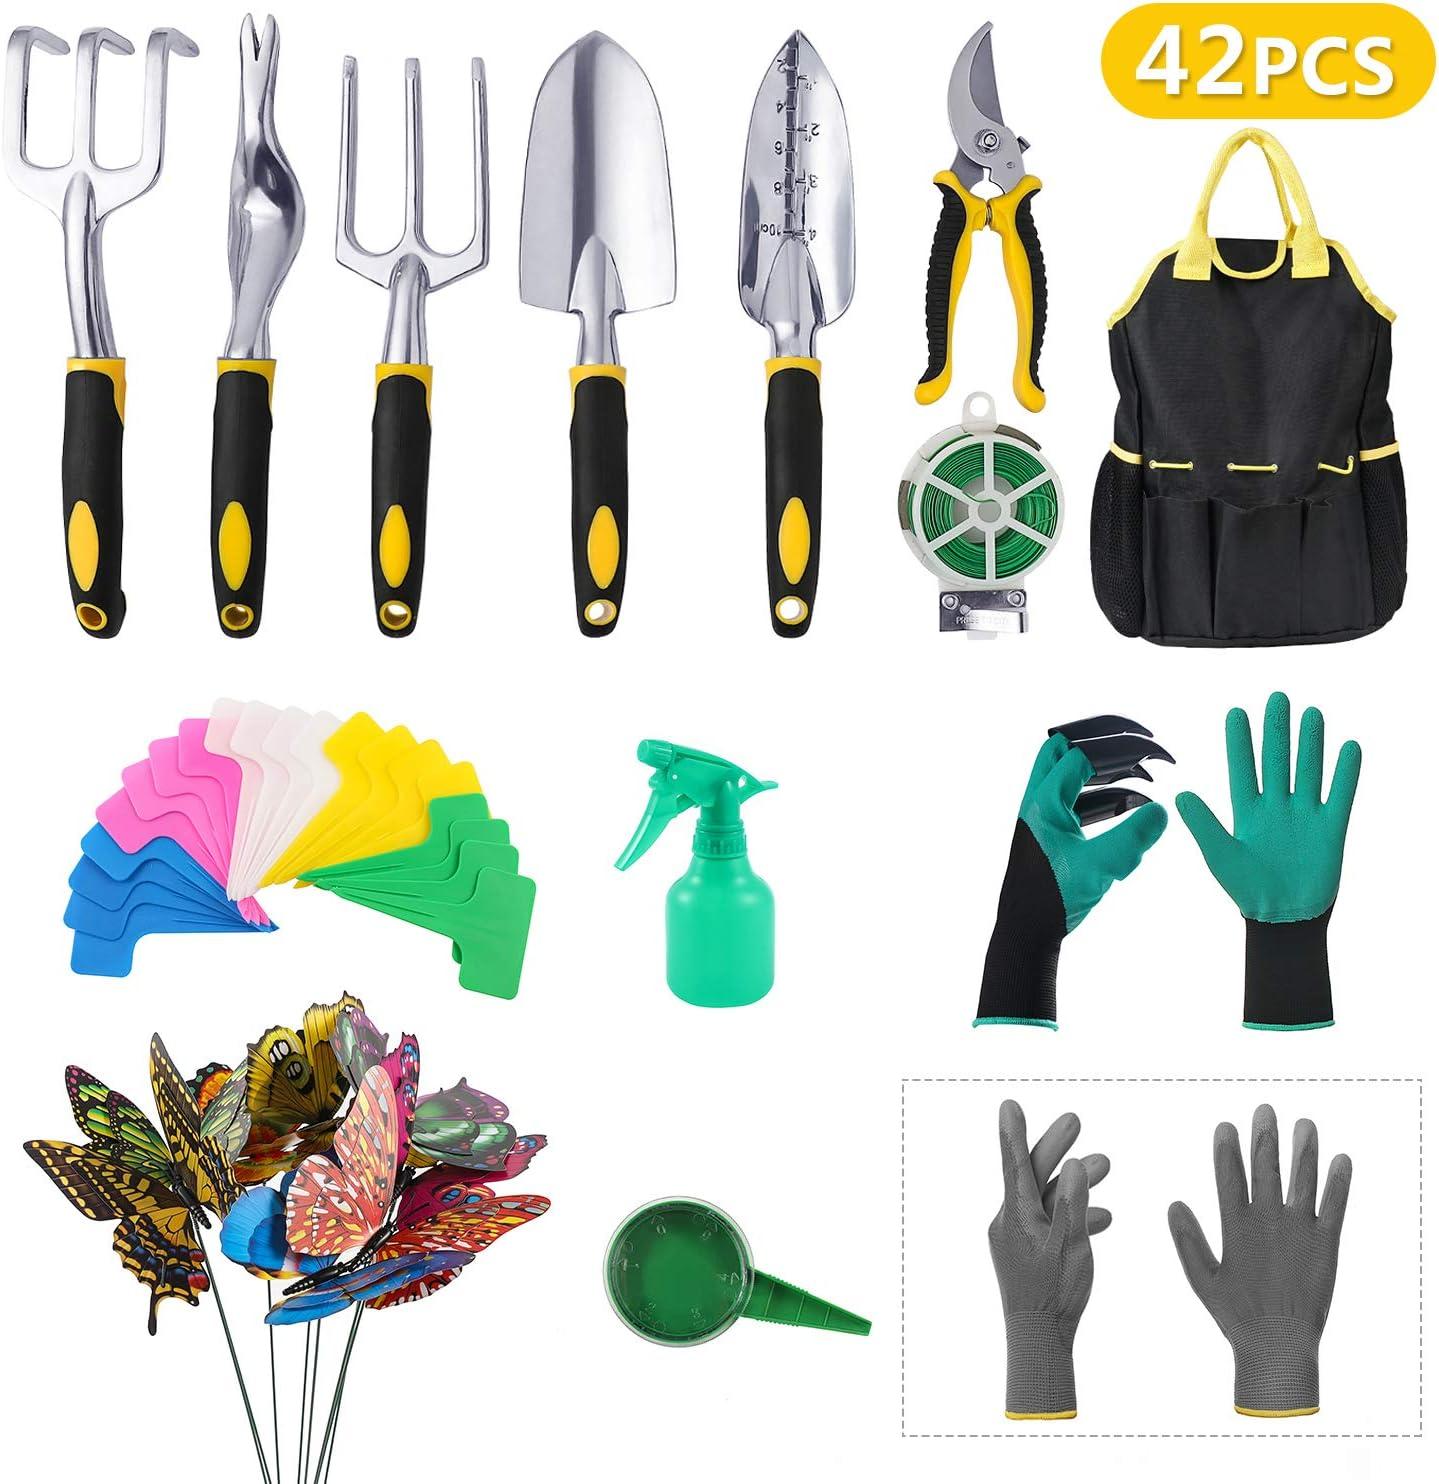 SaphiRose 42 PCS Garden Tools Set - Outdoor Tools Gardening Gifts Heavy Duty Aluminum Hand Garden kit with Garden Storage Bag